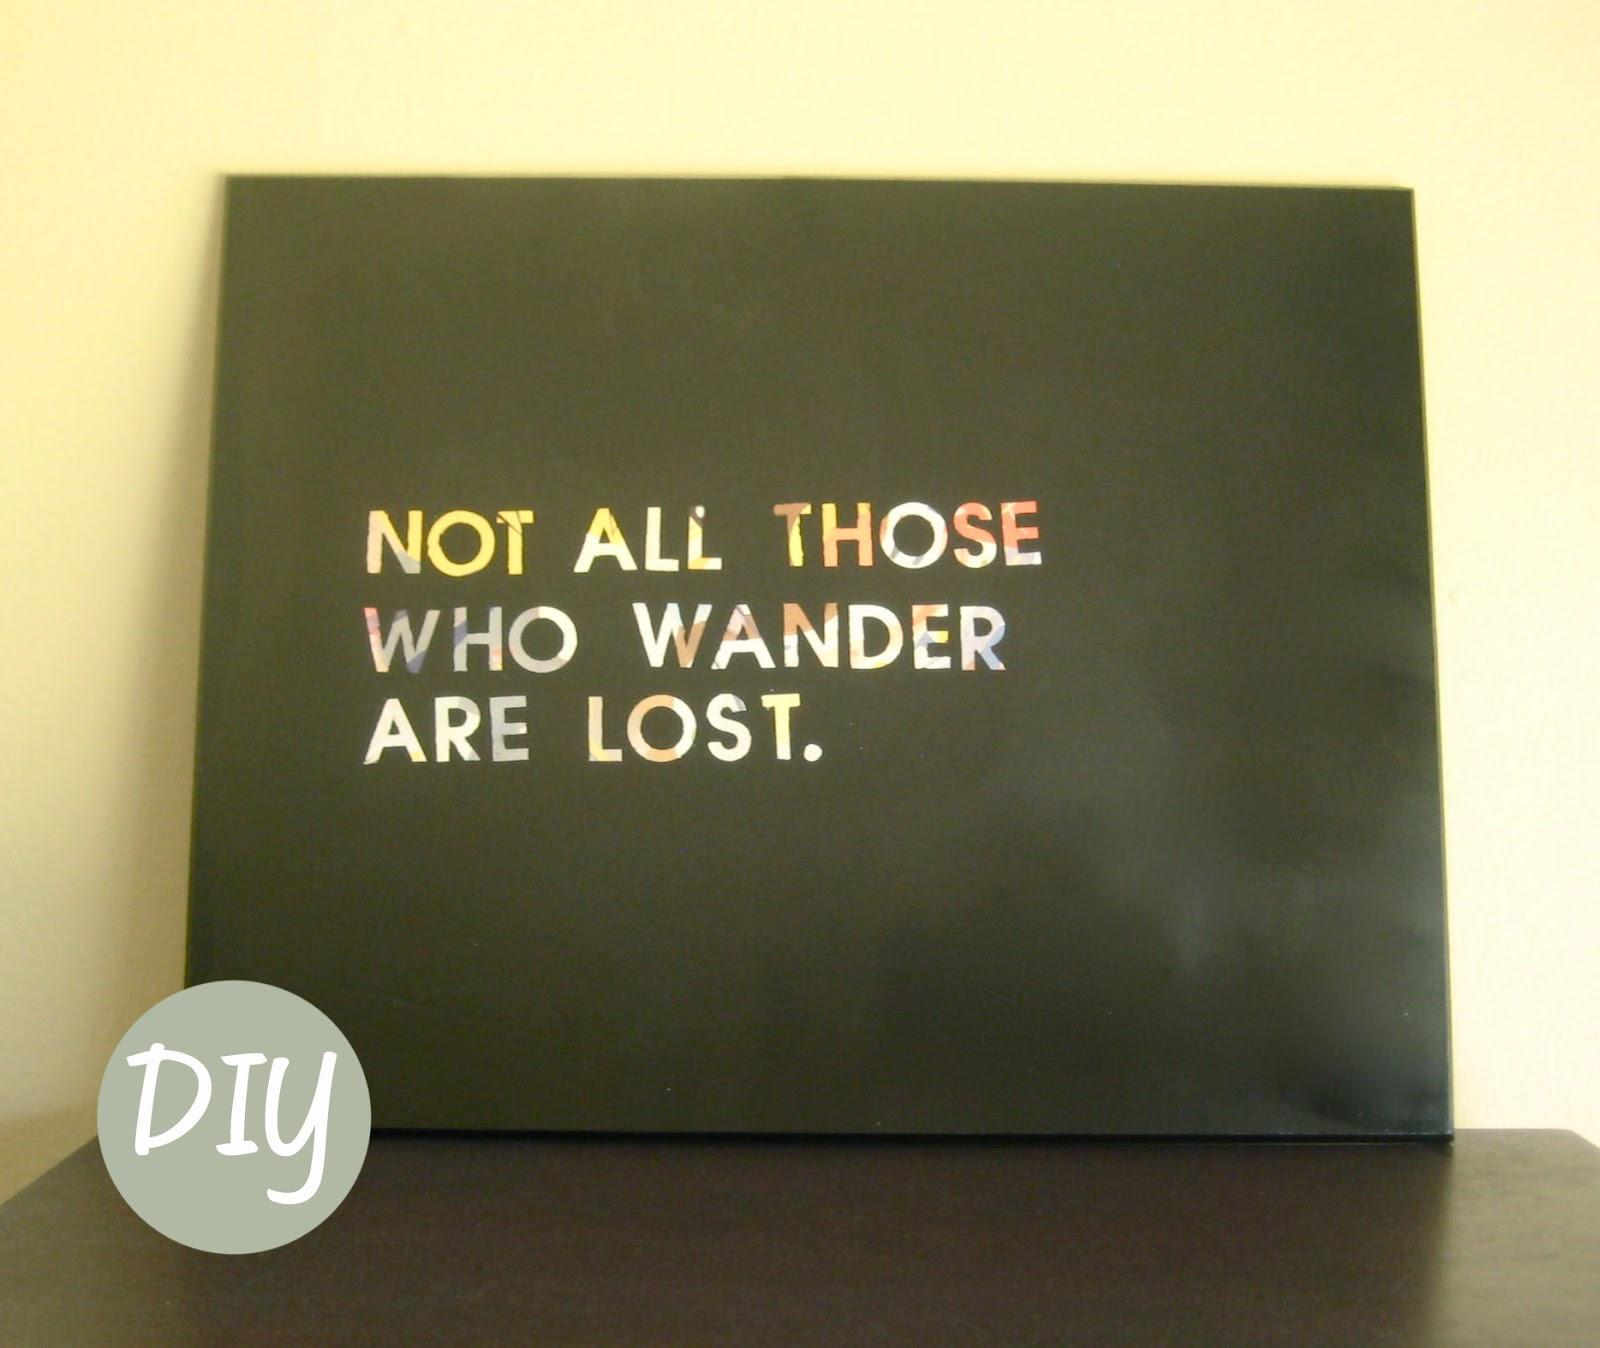 Diy Wall Art Quotes. QuotesGram